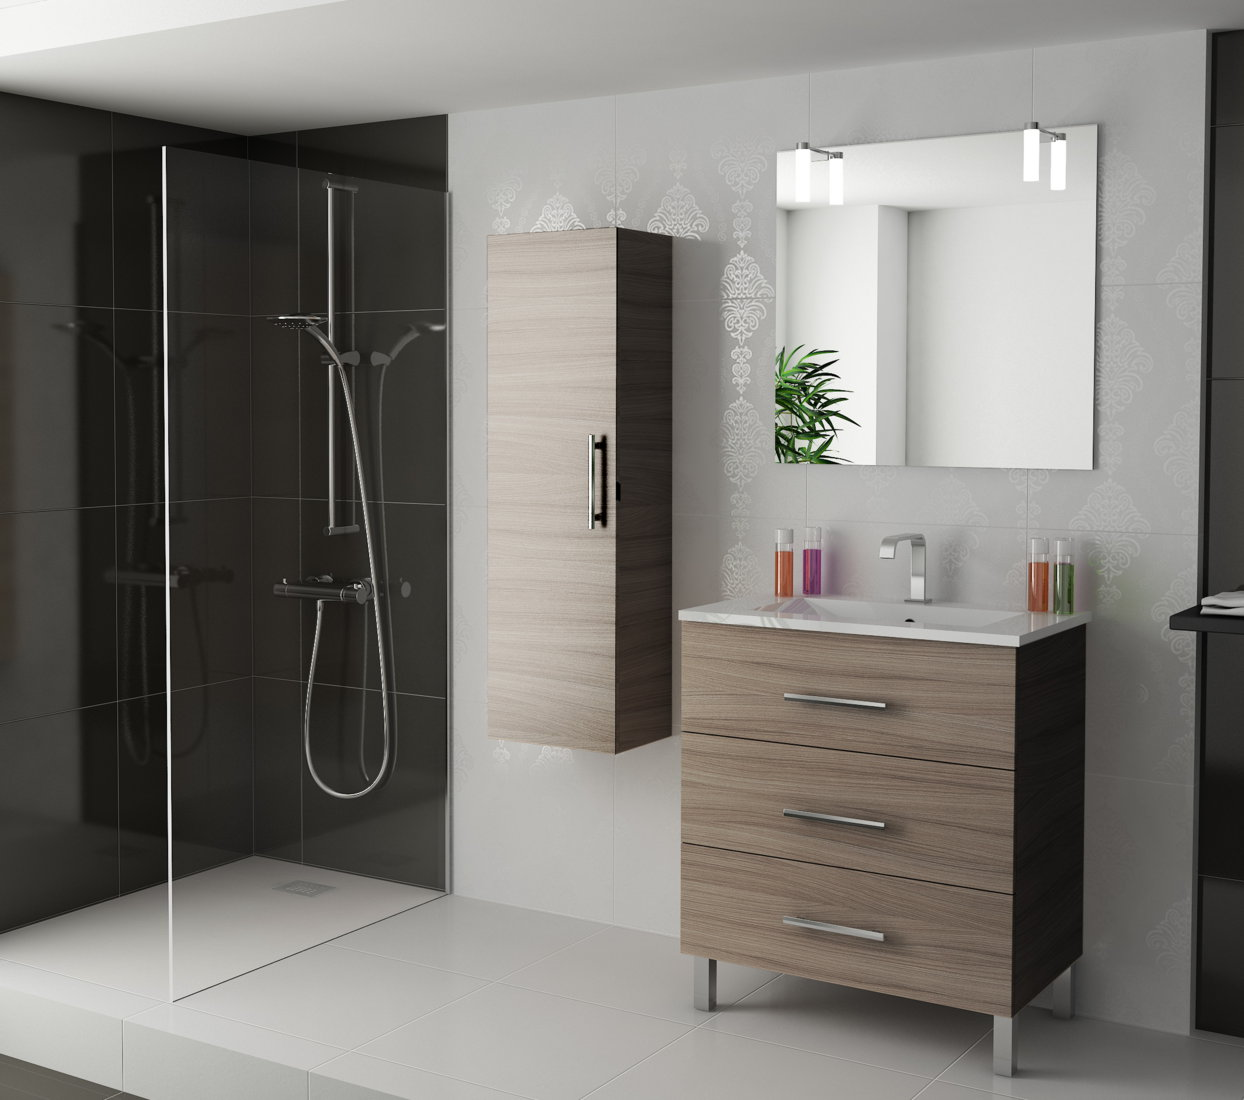 Viberco mueble de ba o con patas modelo lydia 80 cm for Muebles de lavabo de 70 cm